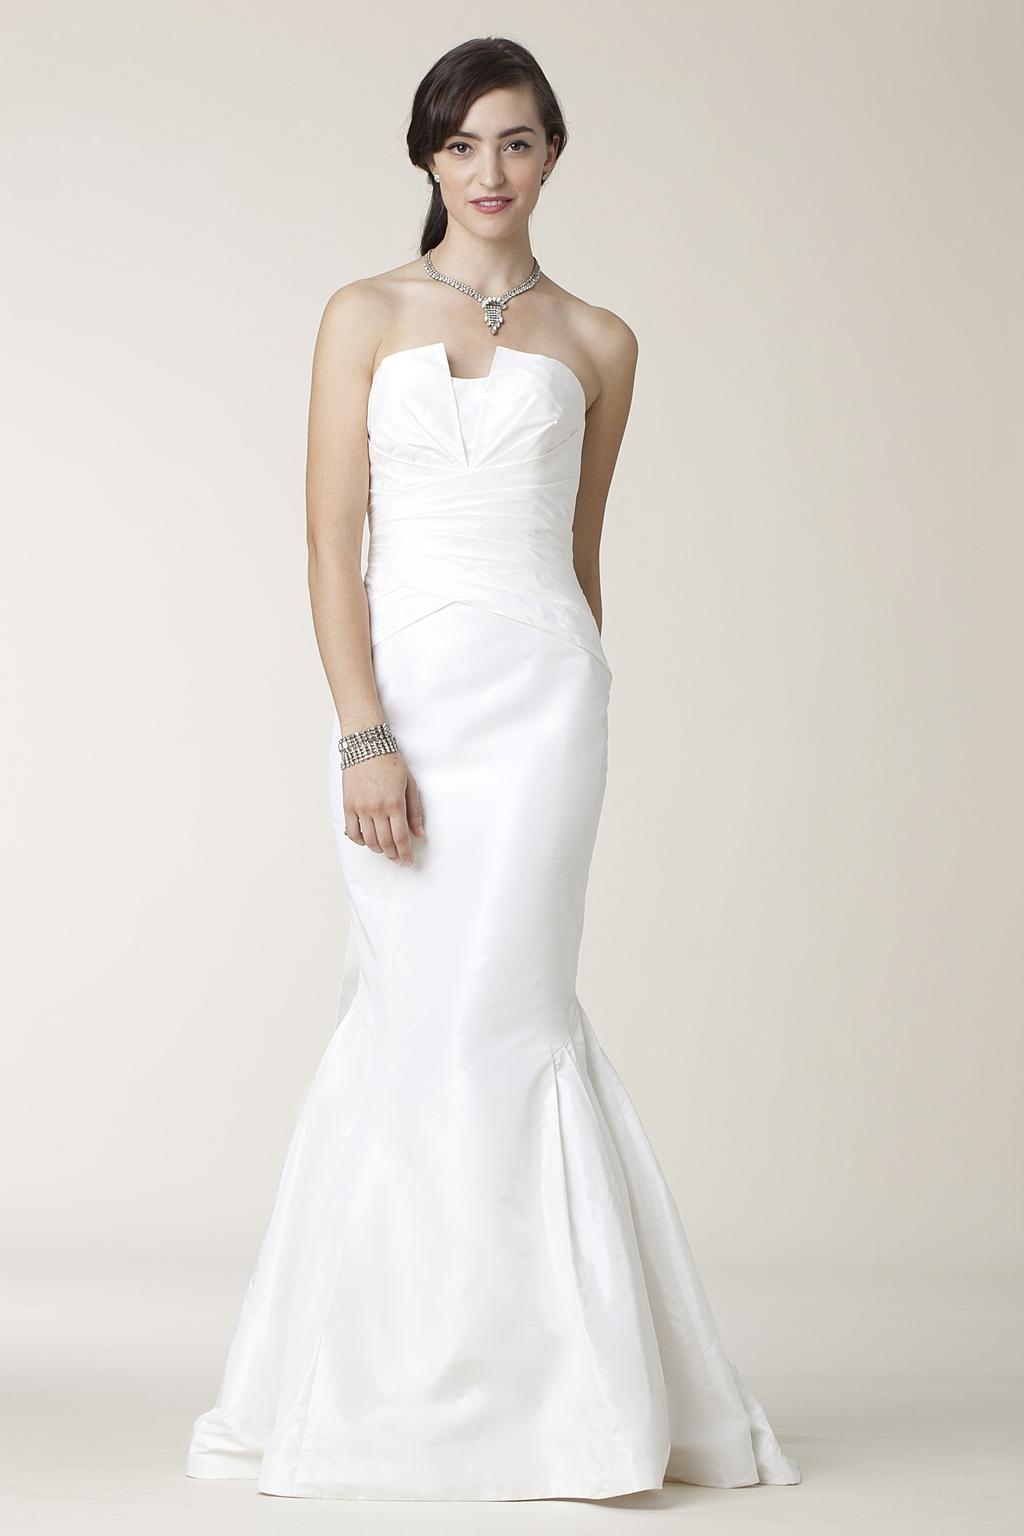 Fillmore-2011-wedding-dress-amy-kuschel.full